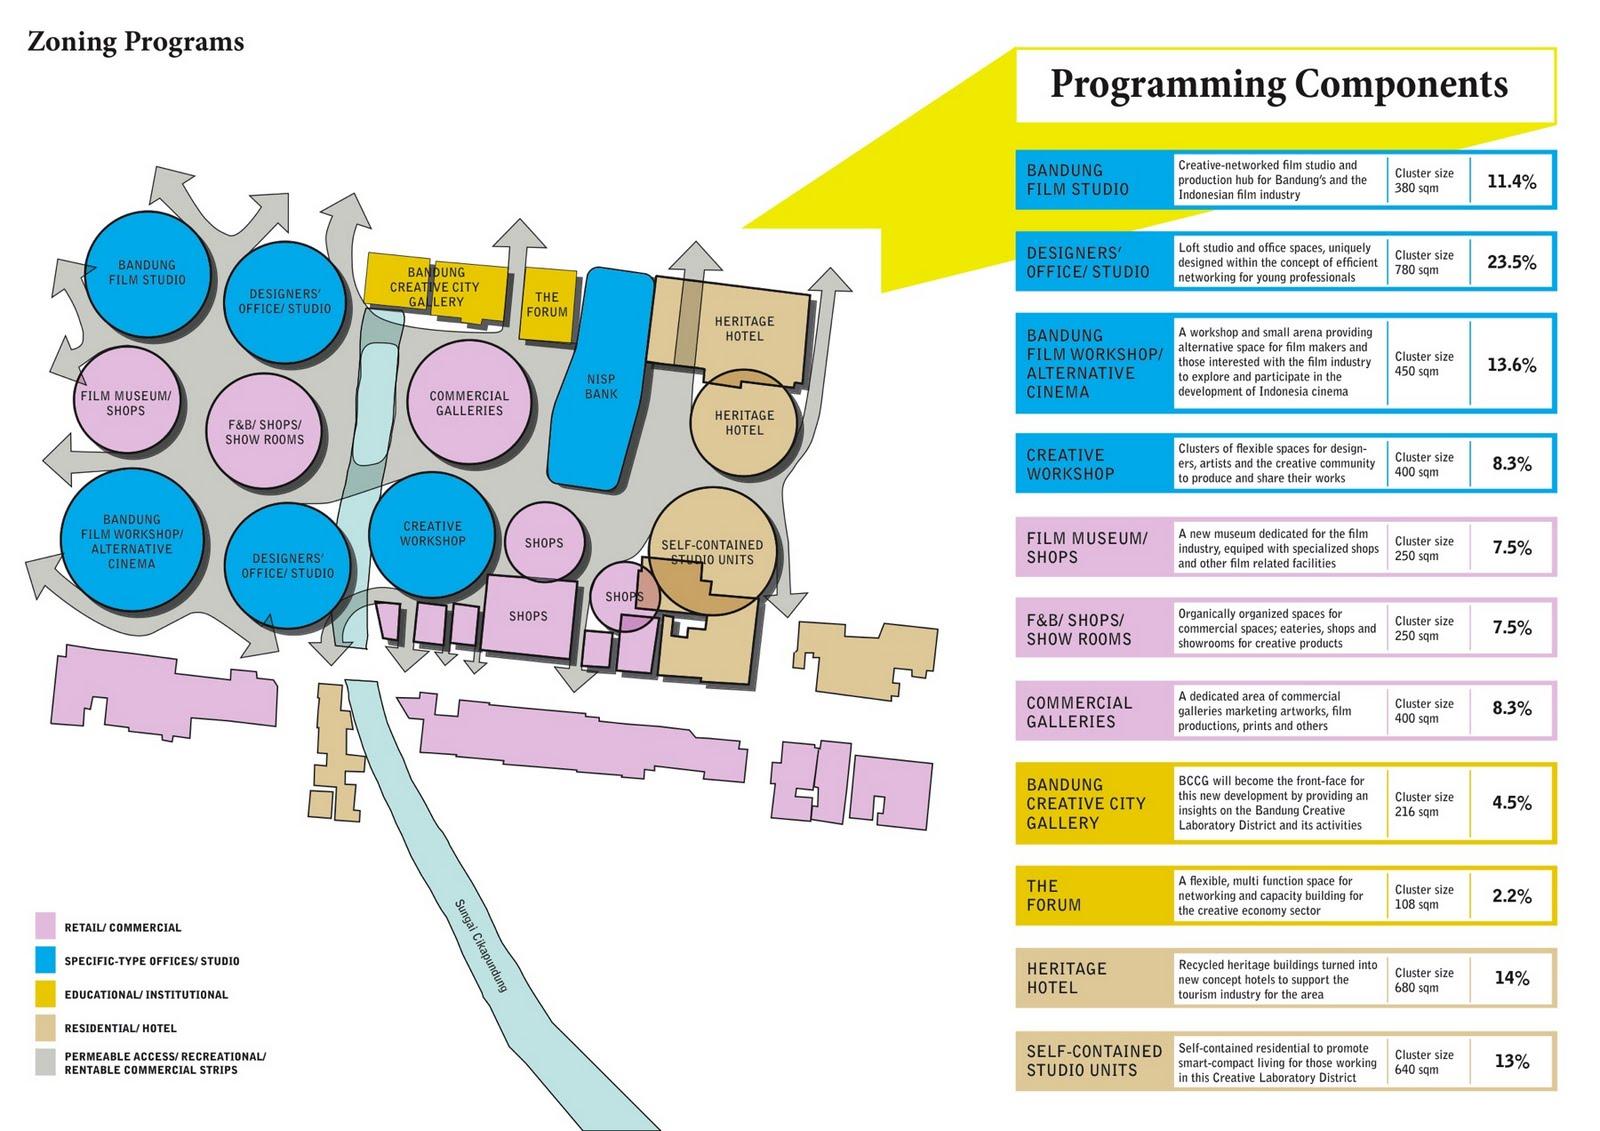 Hafiz amirrol asia afrika zoning and programming for Architecture zoning